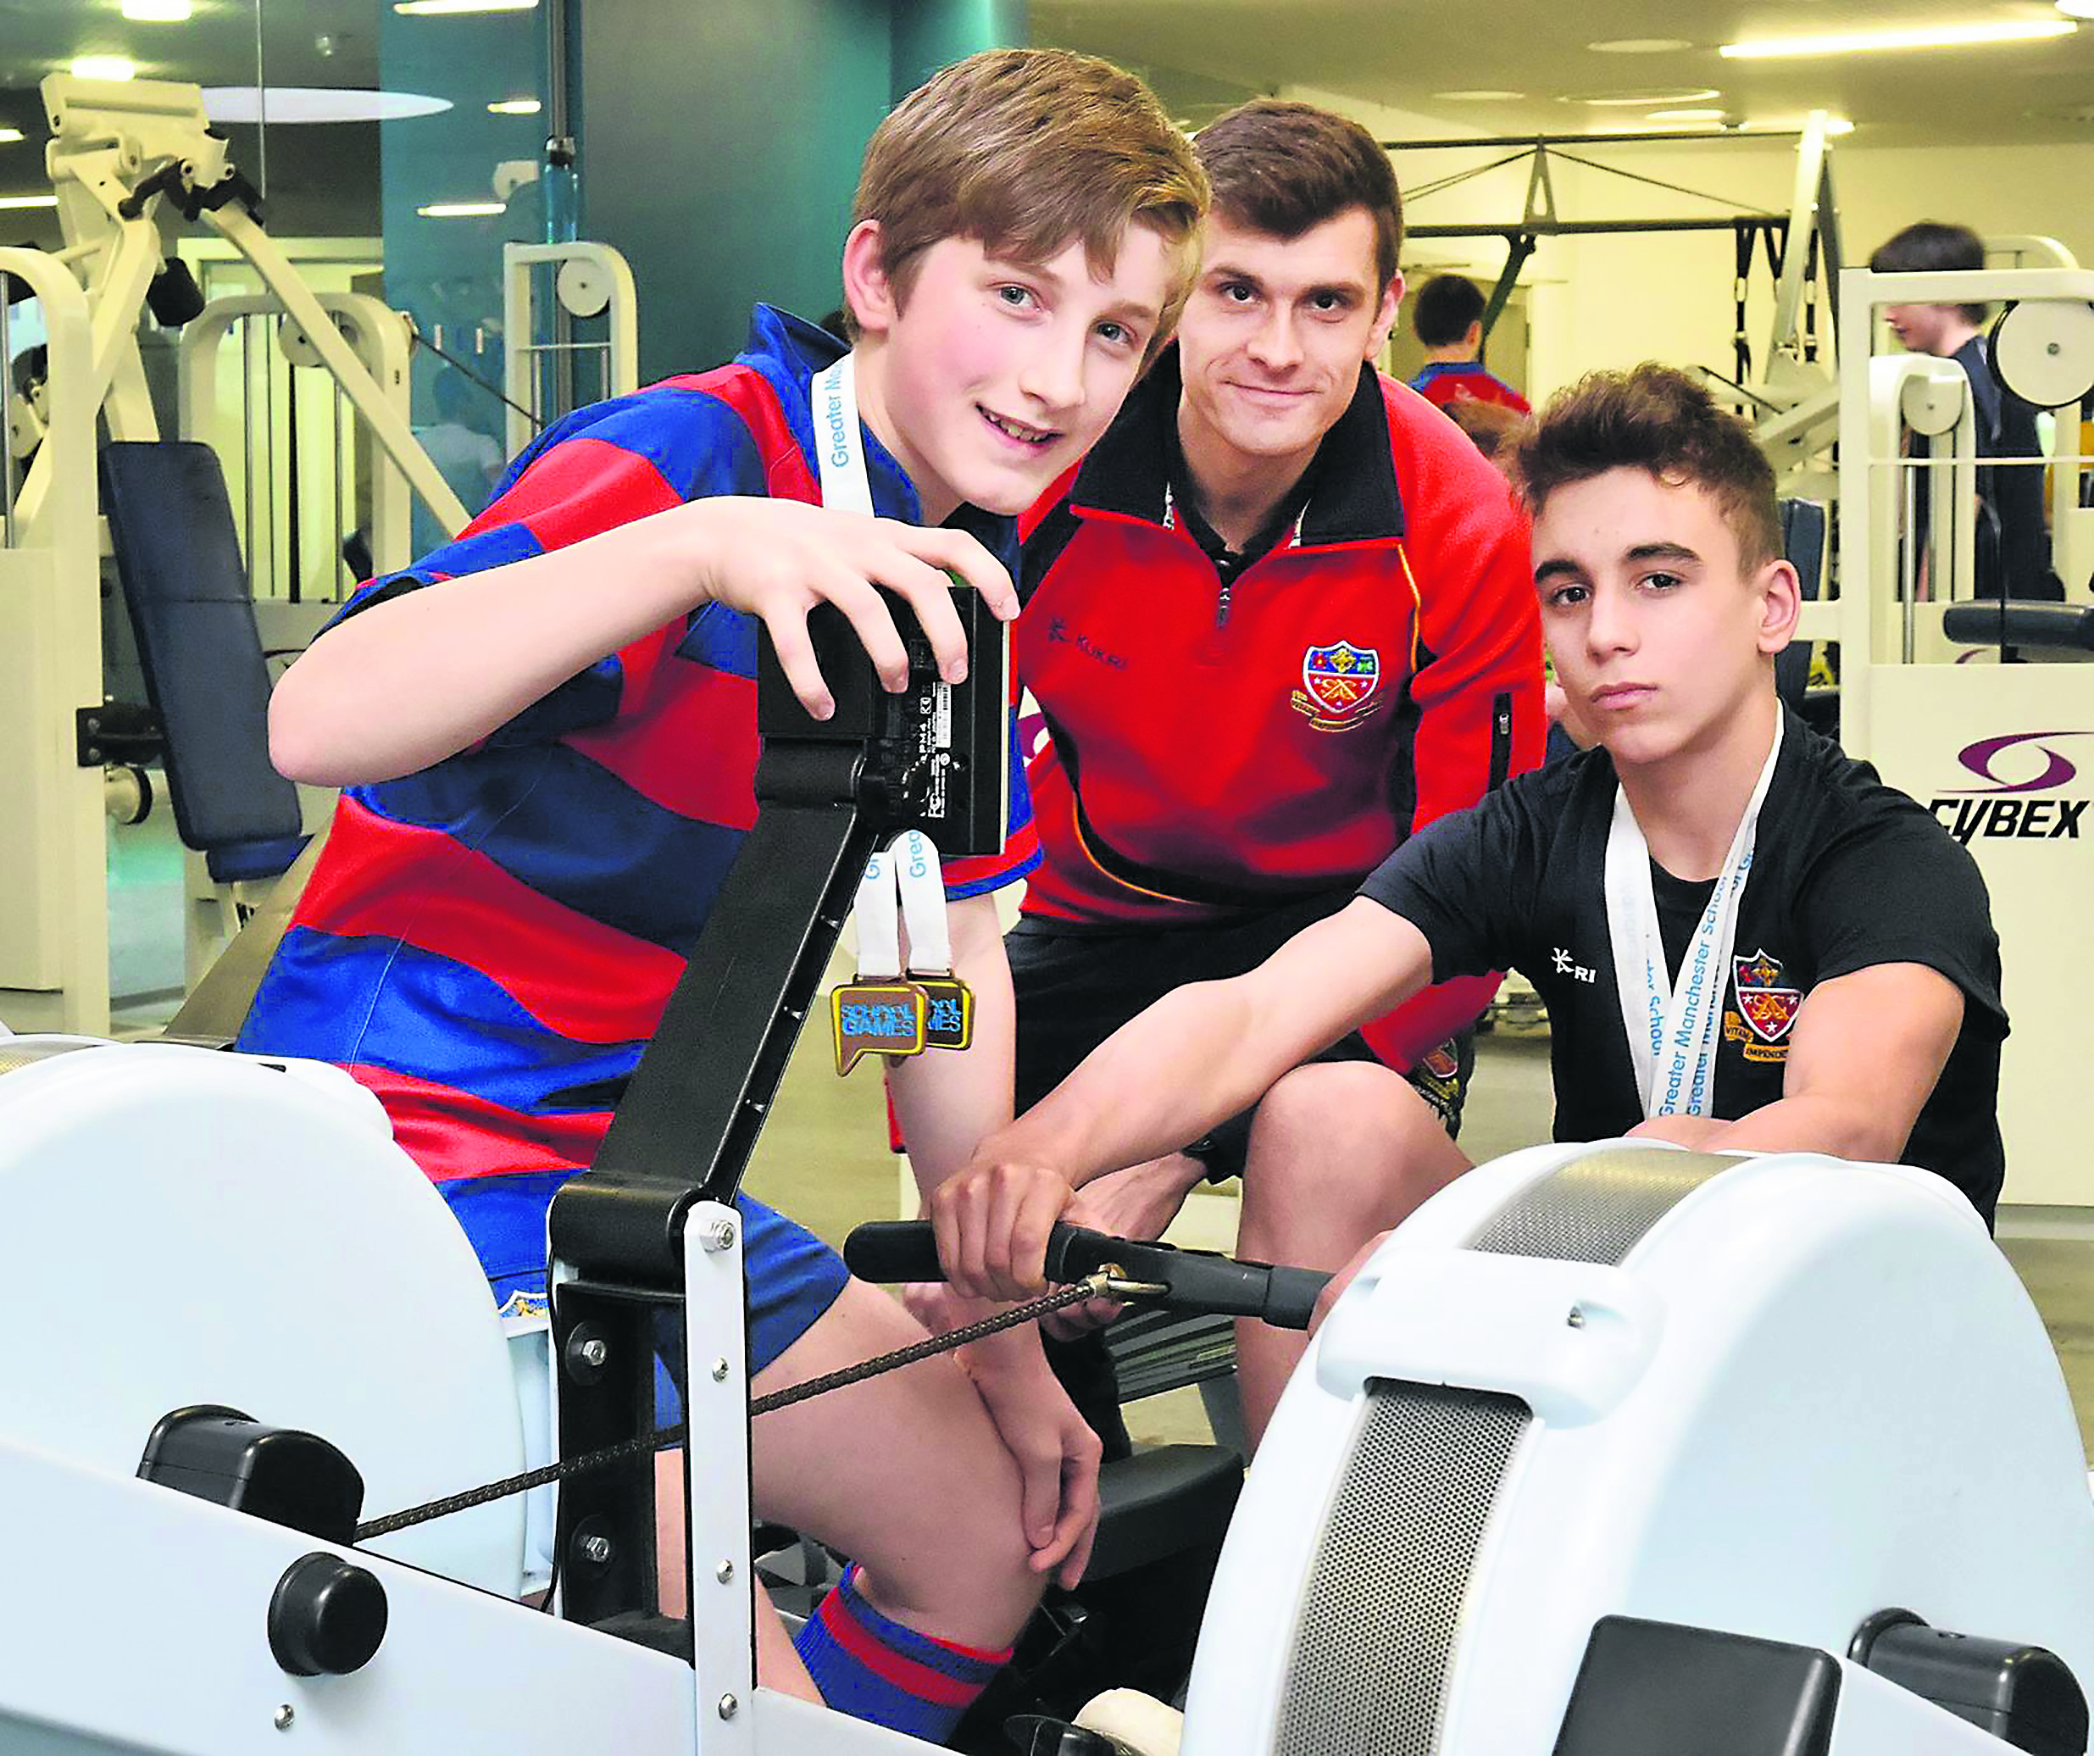 Rowers take three titles